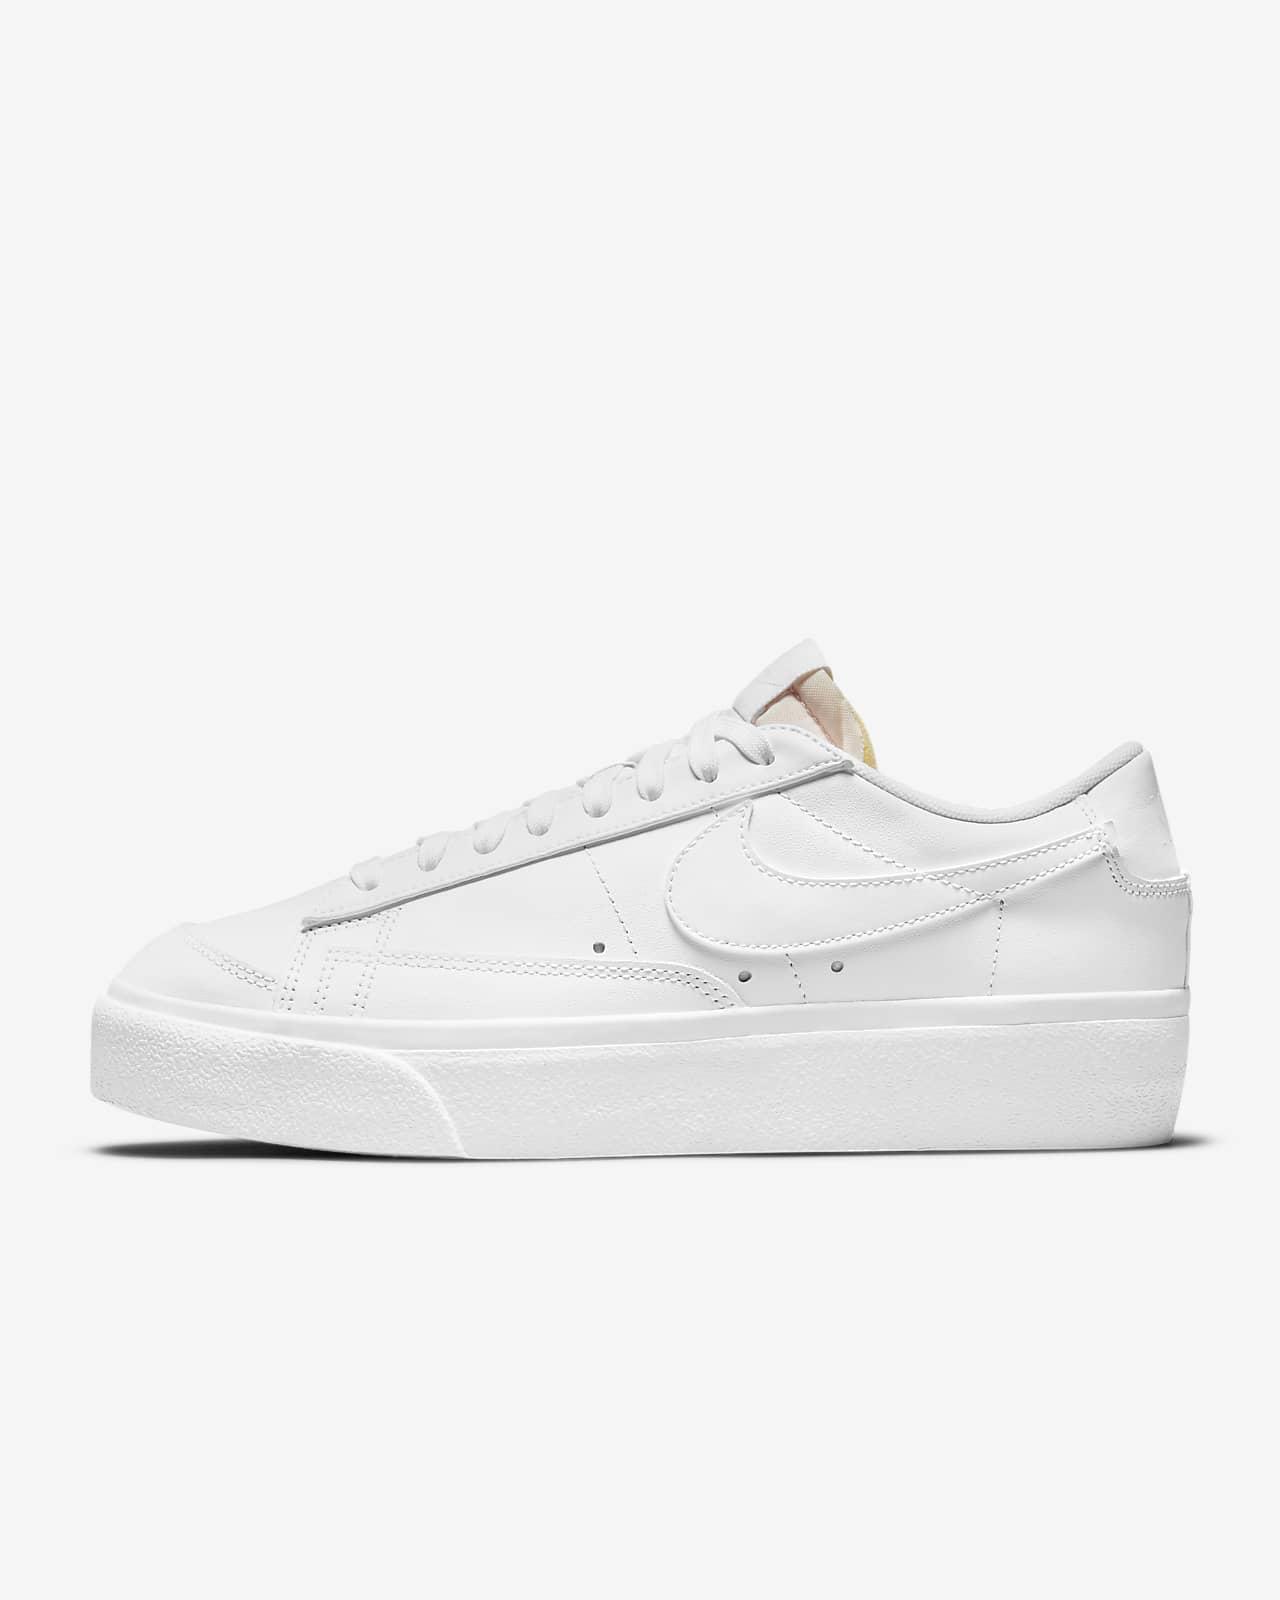 Nike Blazer Low Platform Women's Shoe